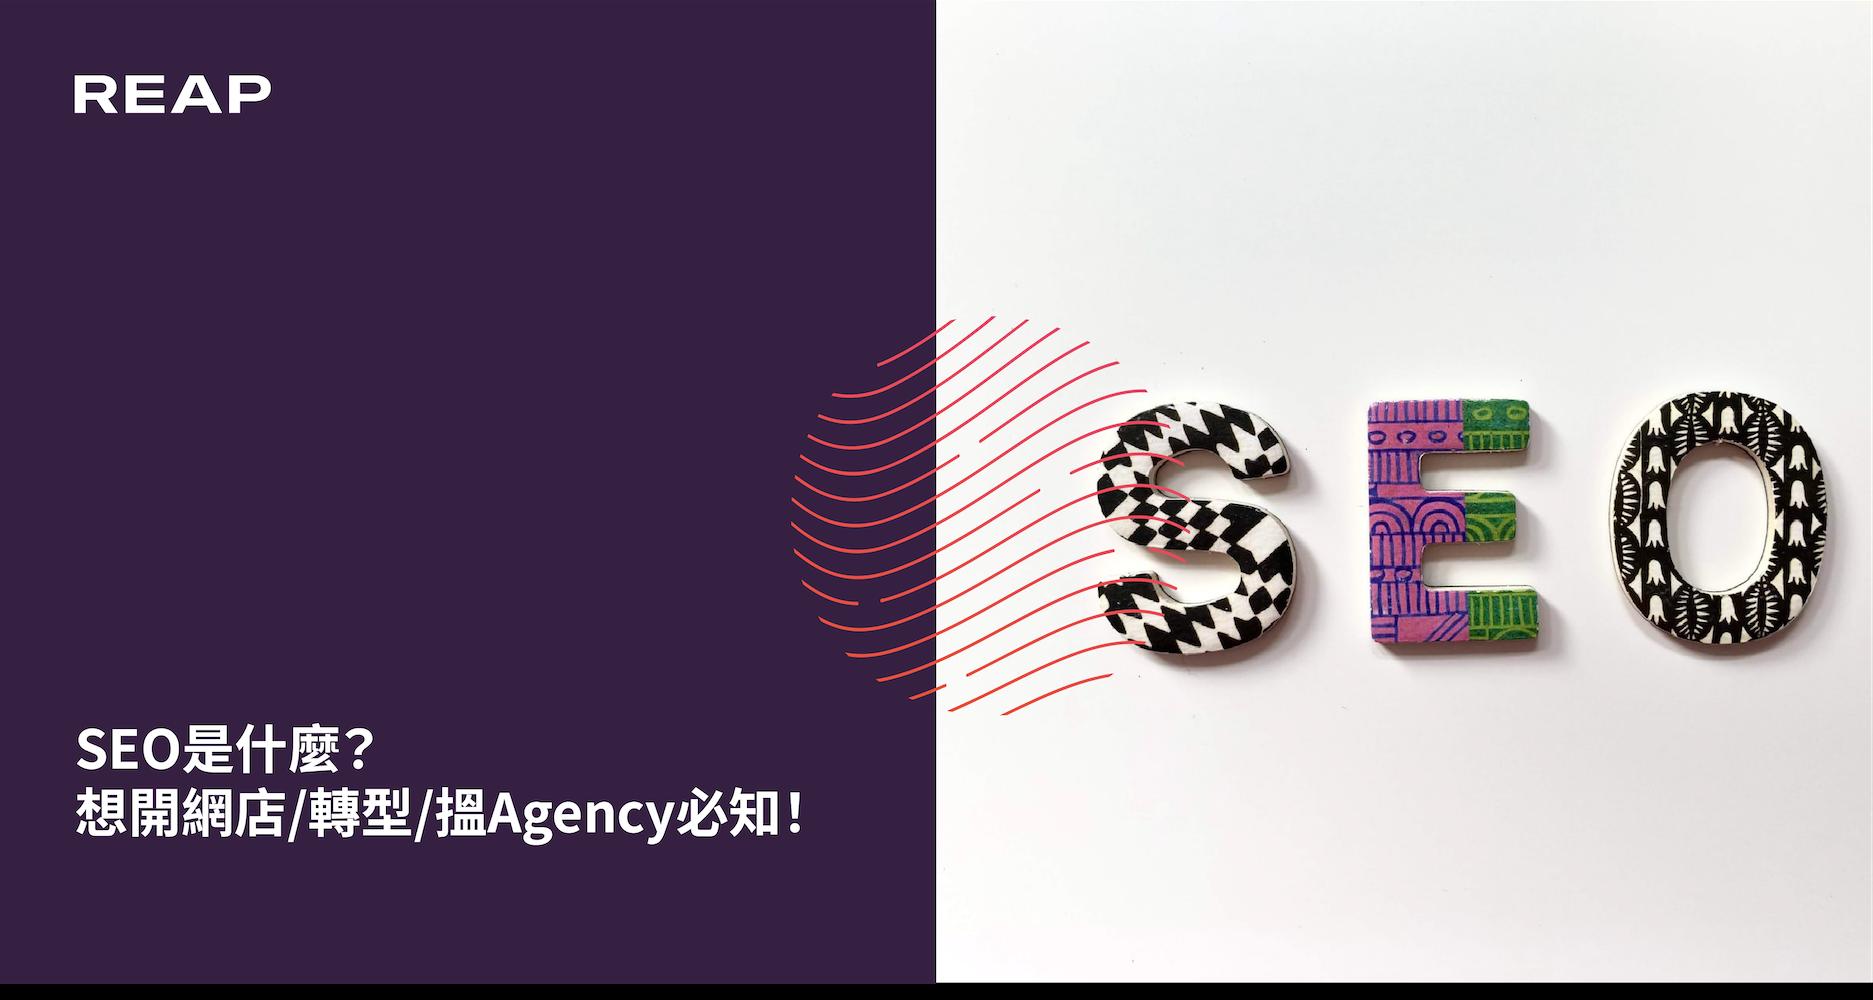 Cover Image for SEO是什麼?想開網店/轉型/搵Agency必知!